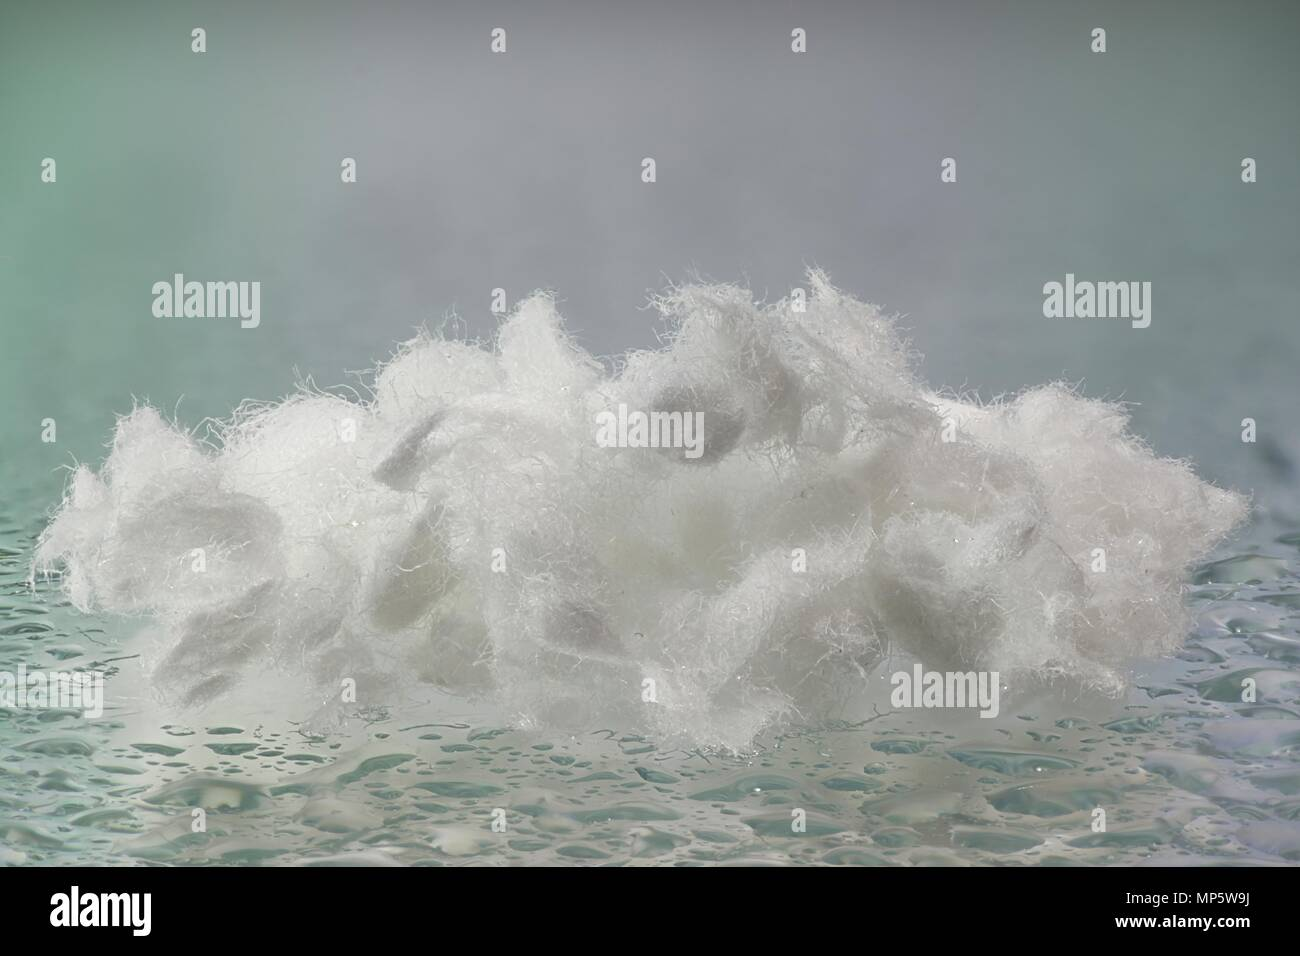 Cellulose fibers - Stock Image